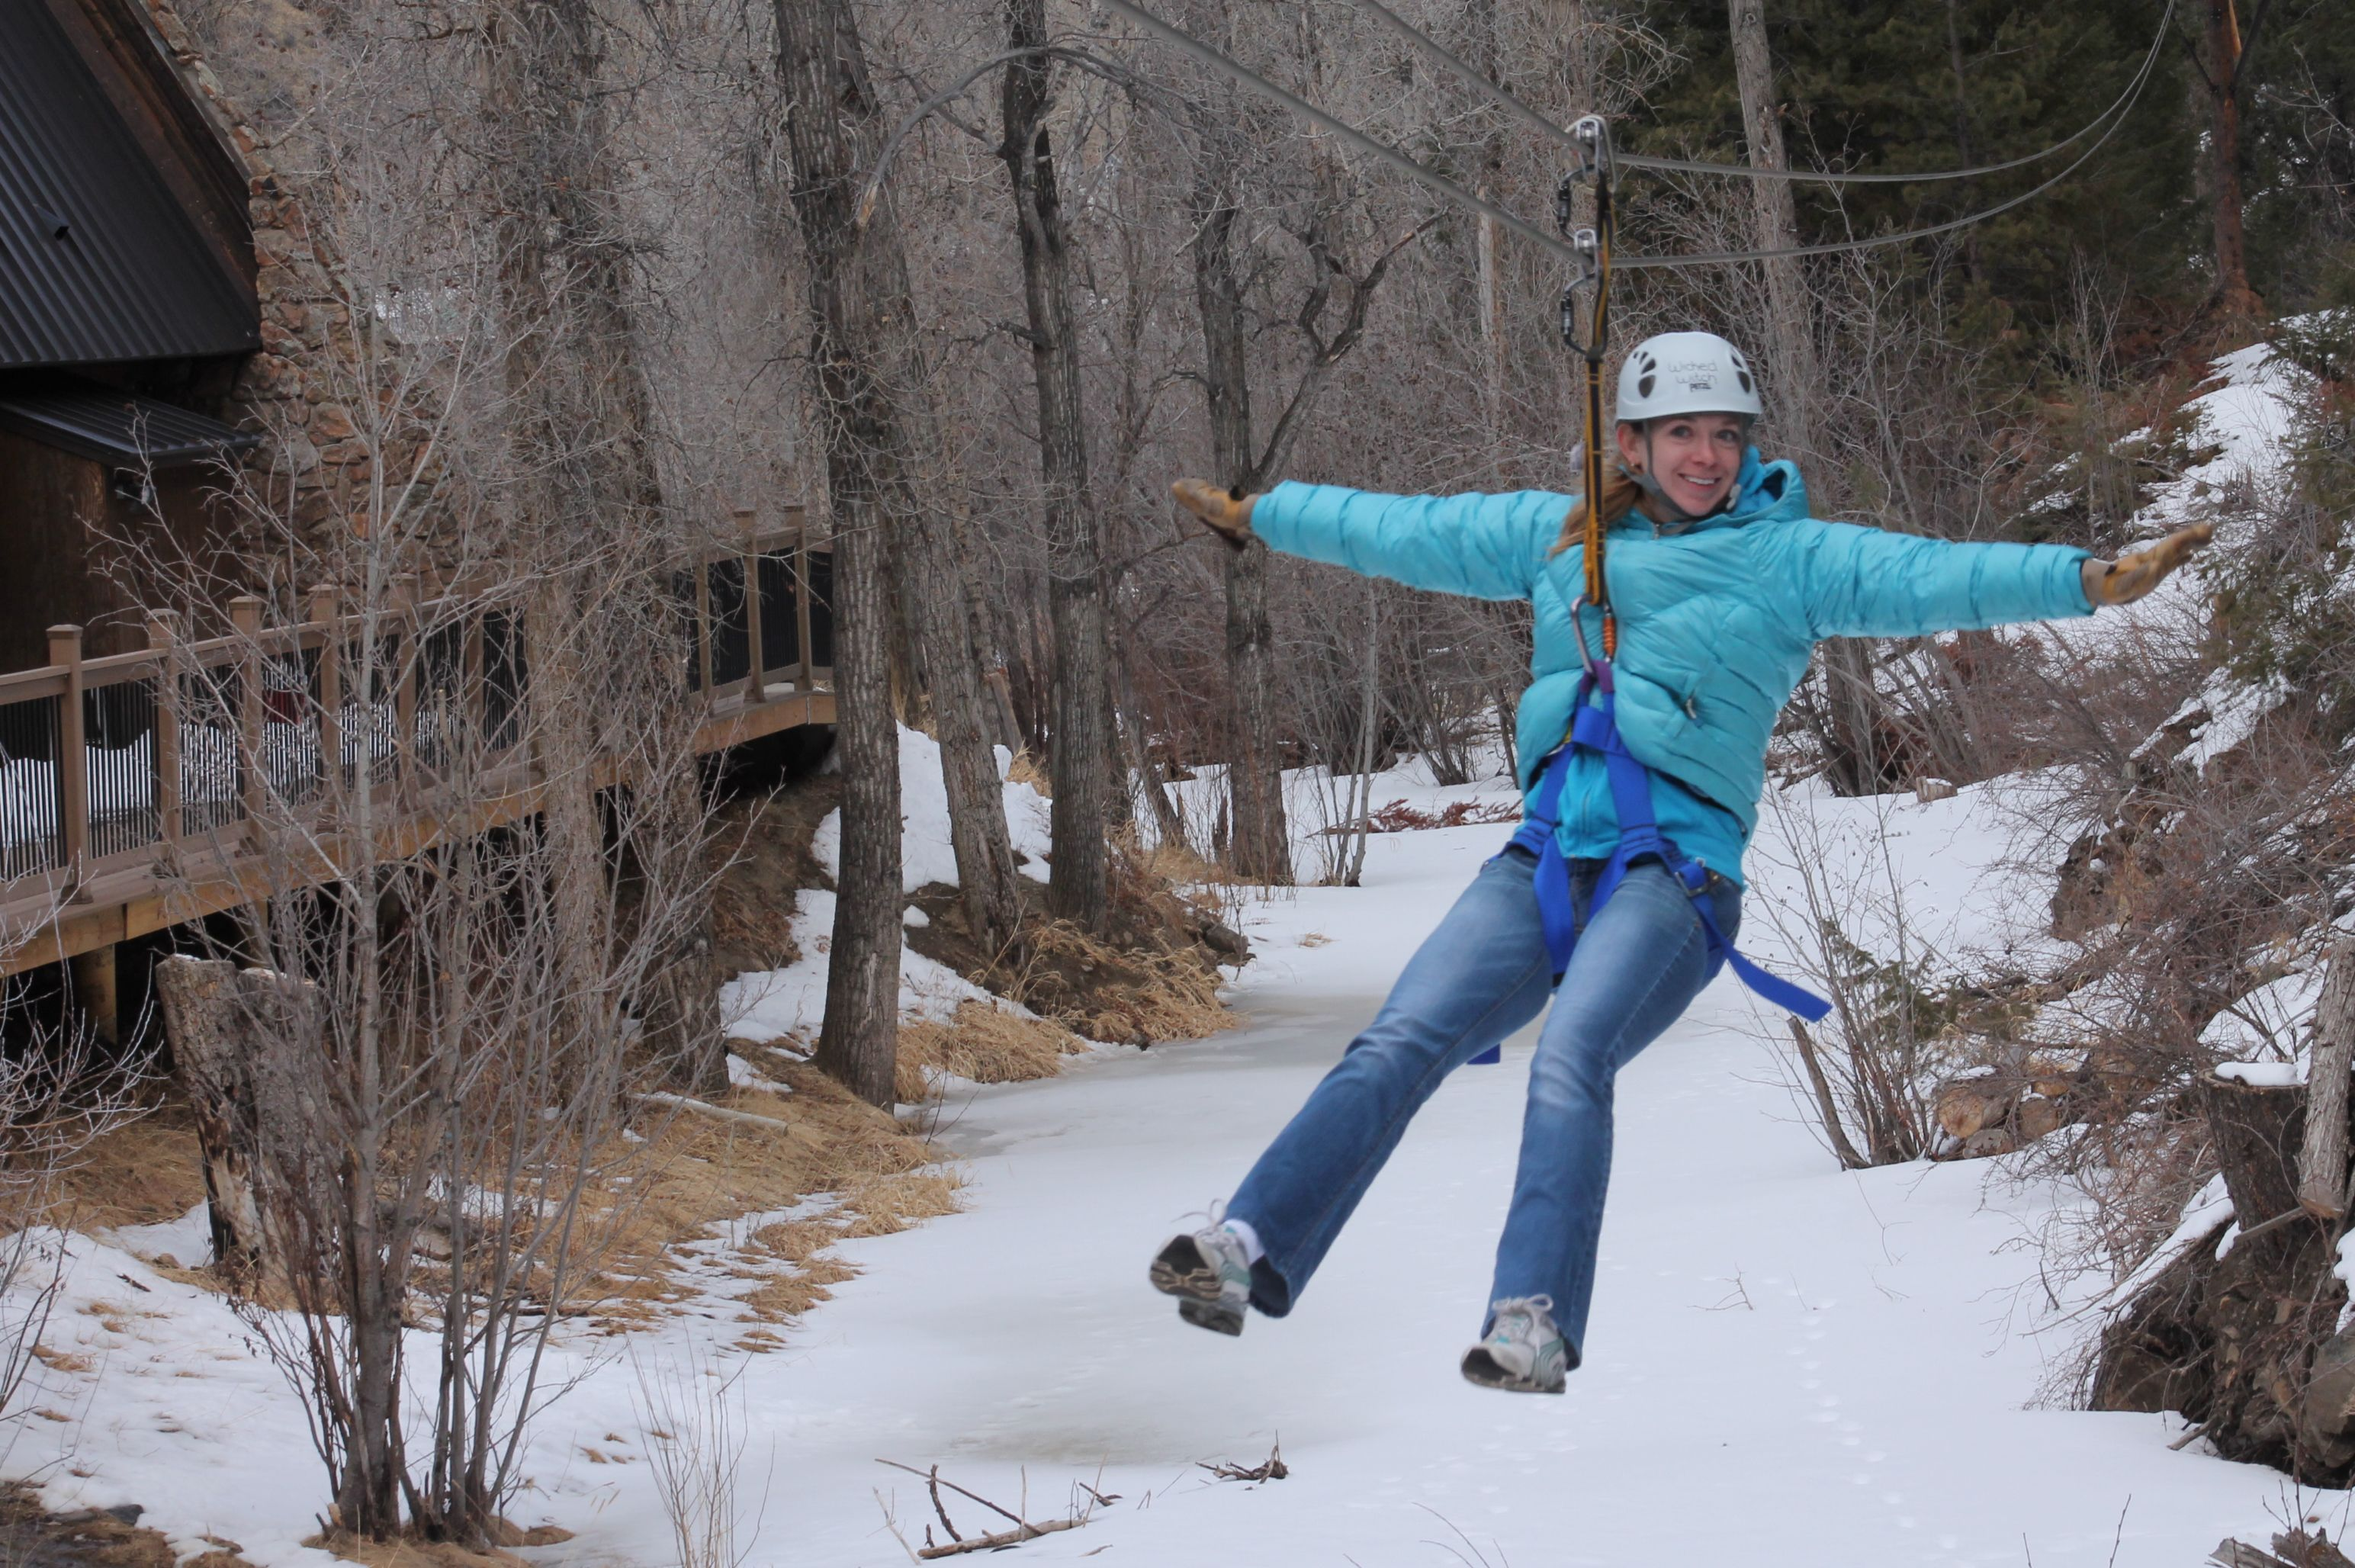 Winter Ziplining In Idaho Springs Co Idaho Springs Ziplining Winter